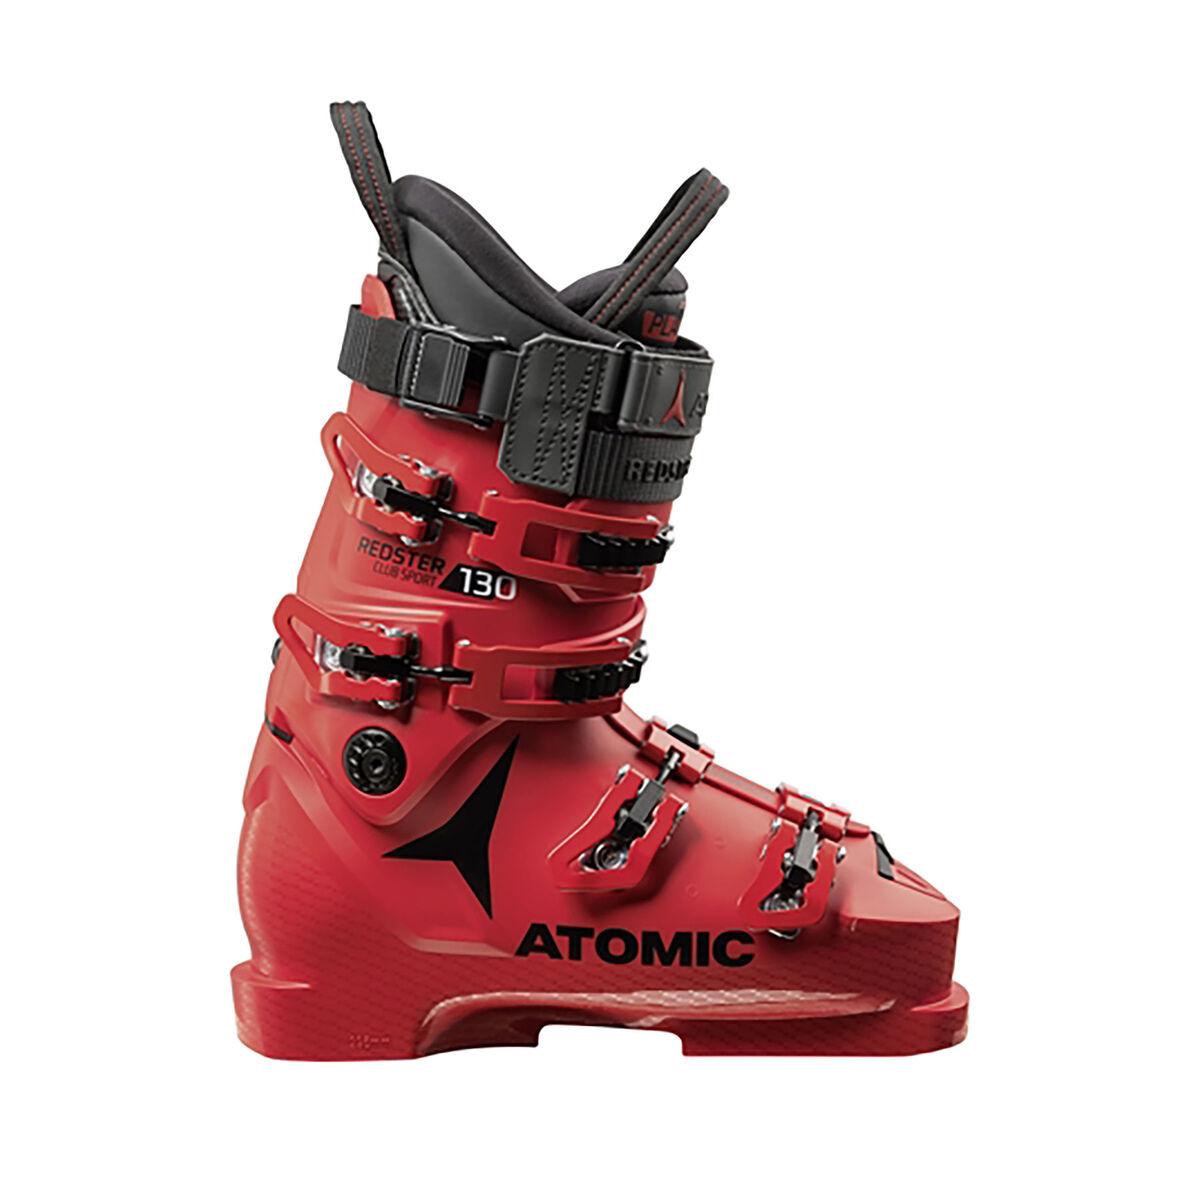 Atomic Redster clubsport 130